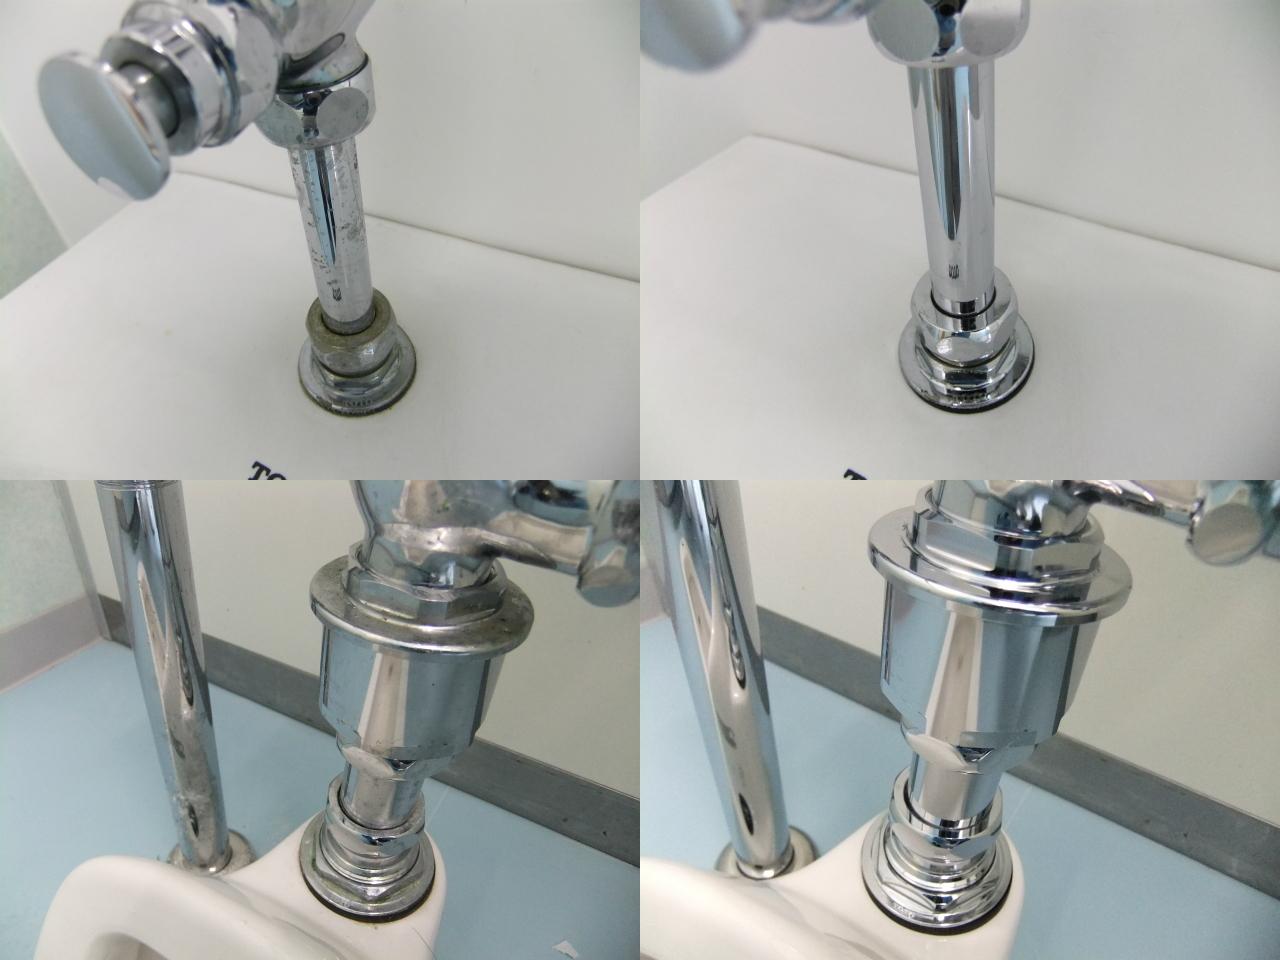 http://ajras.net/images/120807-toilet1.jpg